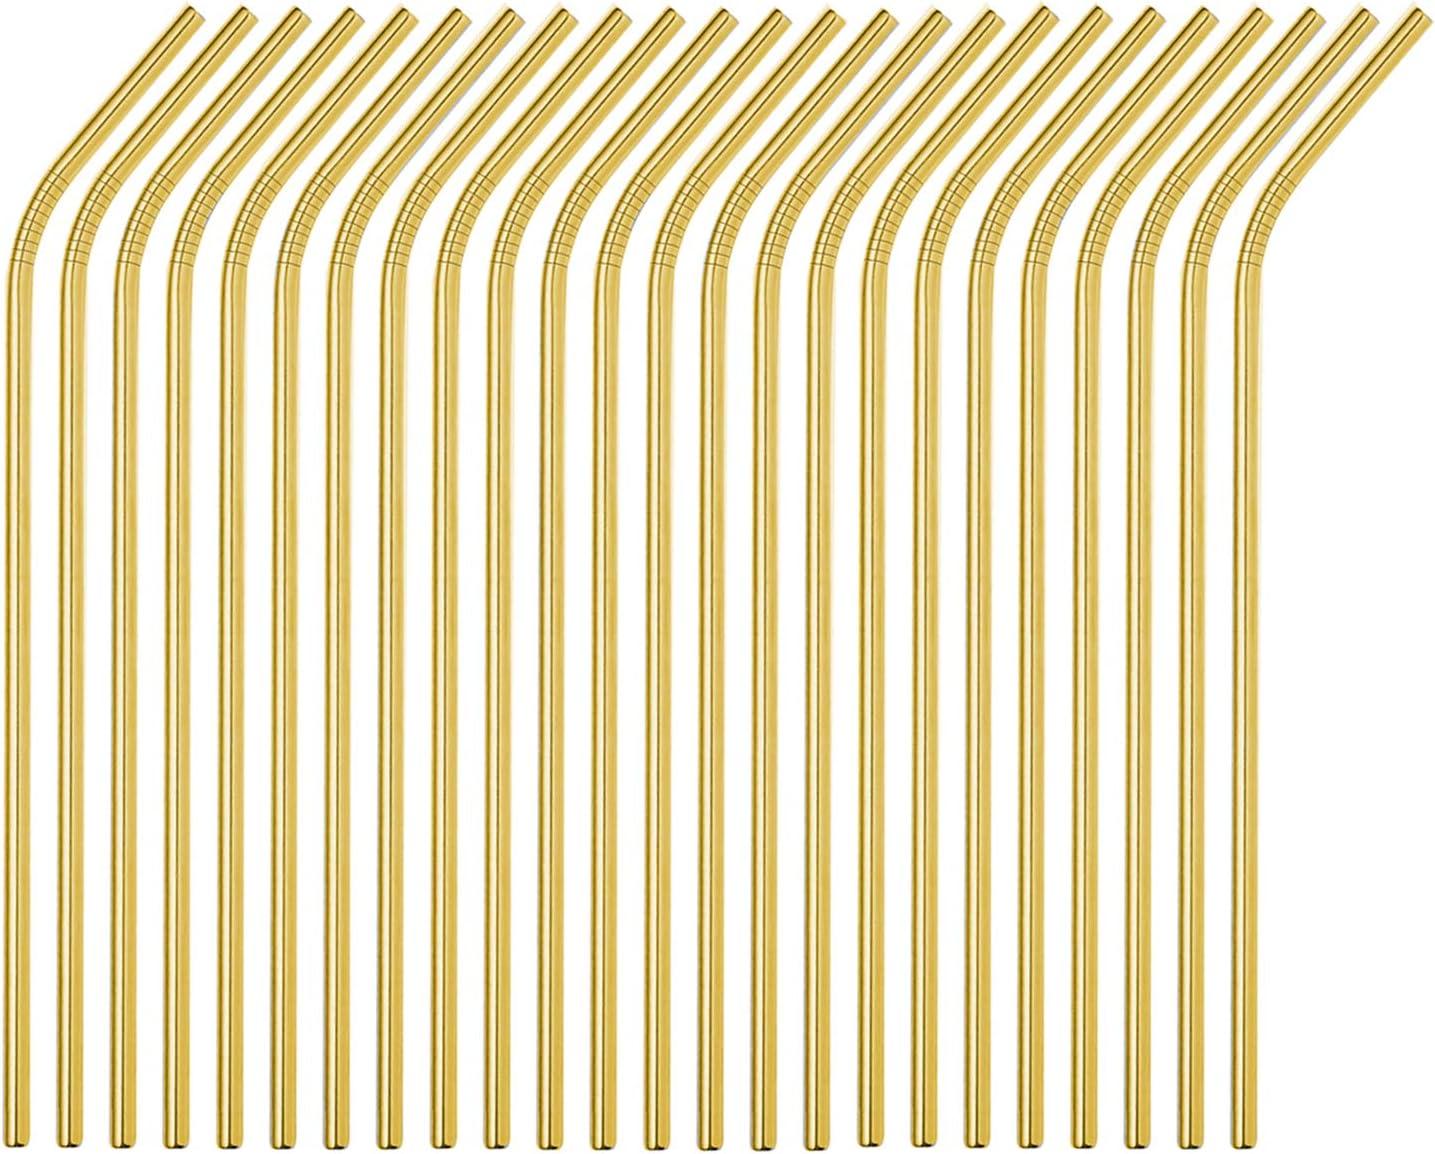 Brightbuy Metal Straws 100 Piece 正規品 Bulk Steel ランキングTOP5 Be Stainless 10.5''